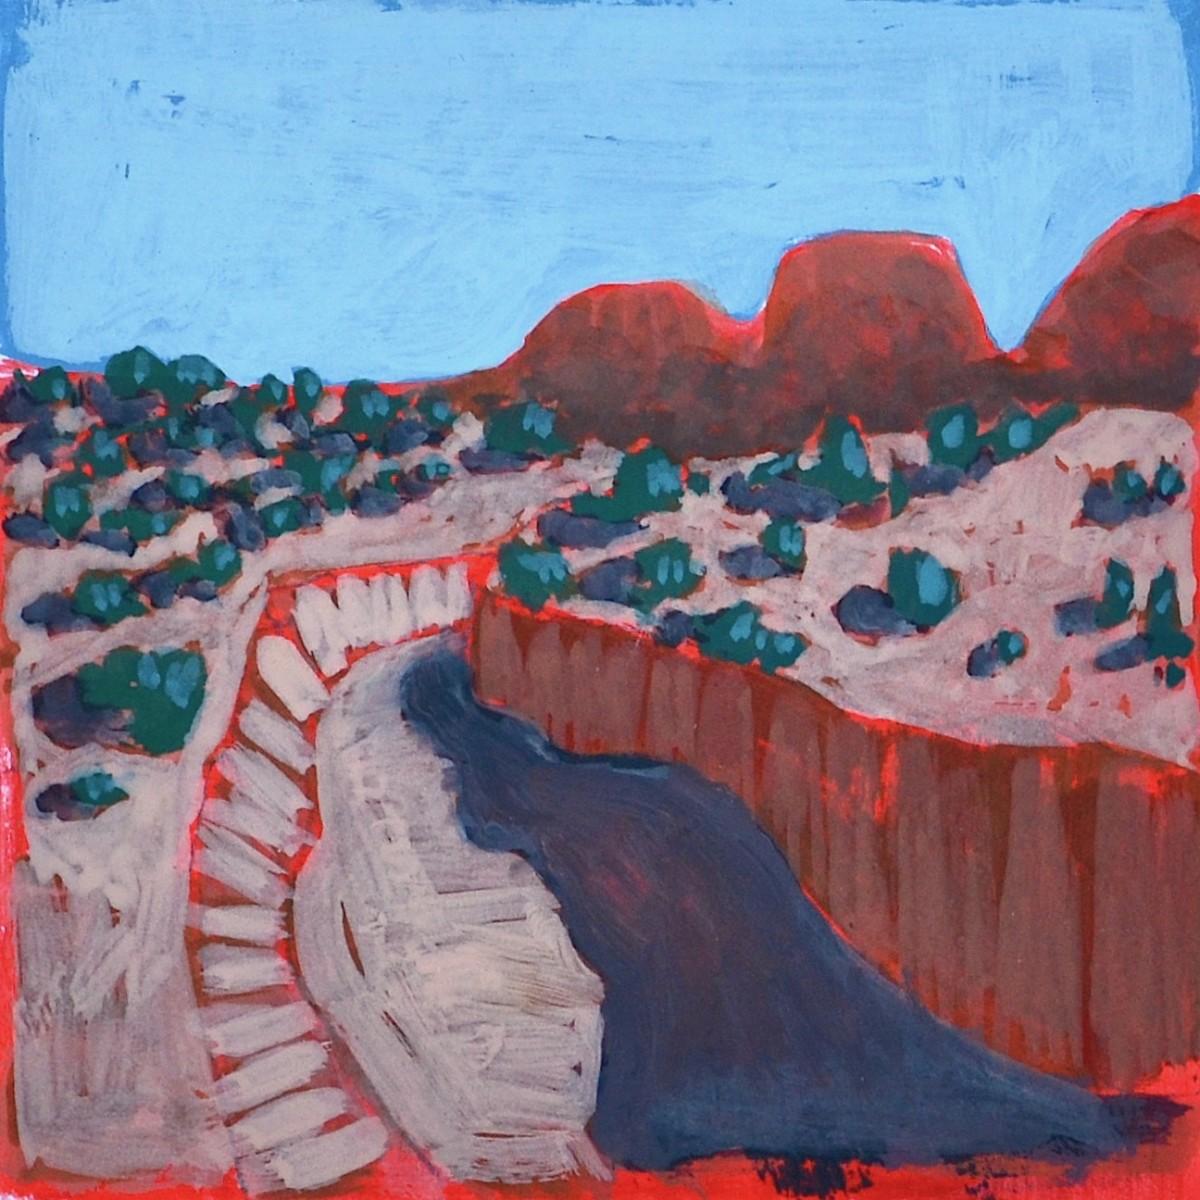 Caprock Canyons by Layla Luna